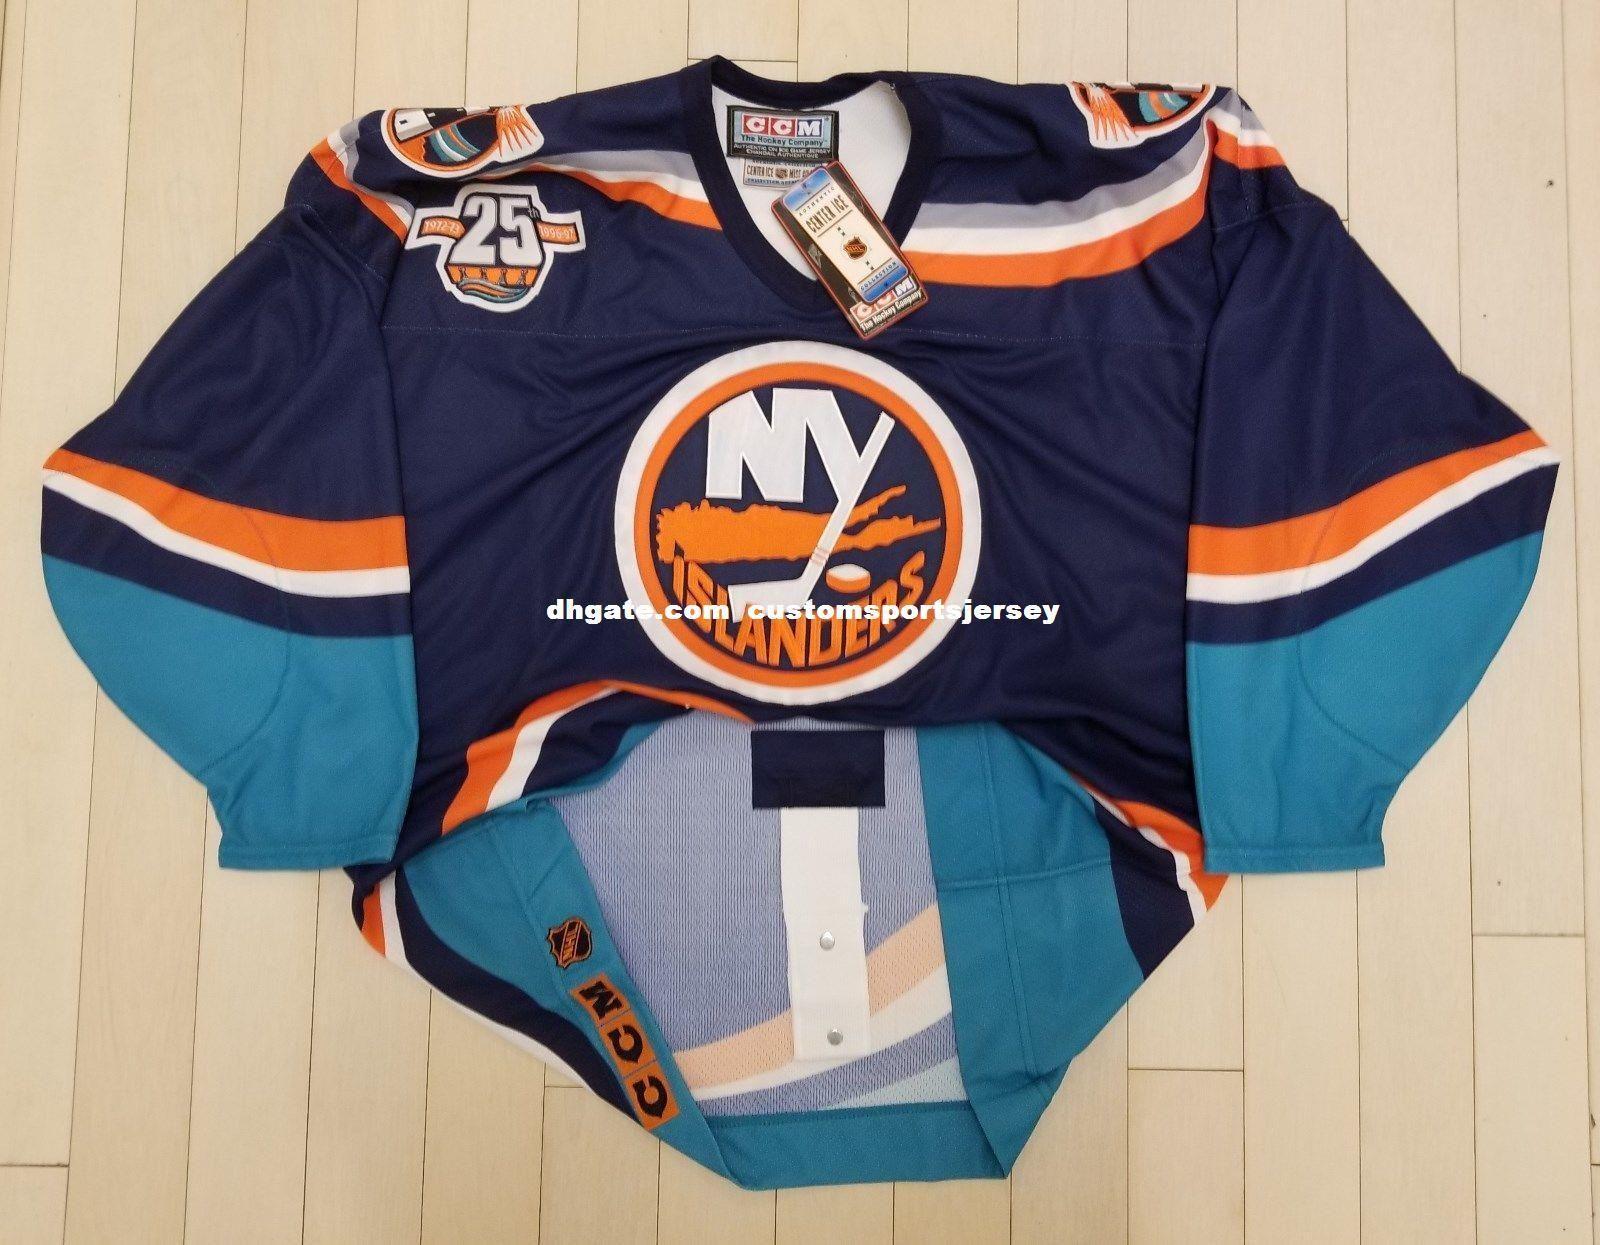 promo code 6c65a 1409a Cheap custom New York Islanders Vintage CCM Center Ice Pro Hockey Jersey  Wave Fisherman Stitched Blank jersey XS-6XL